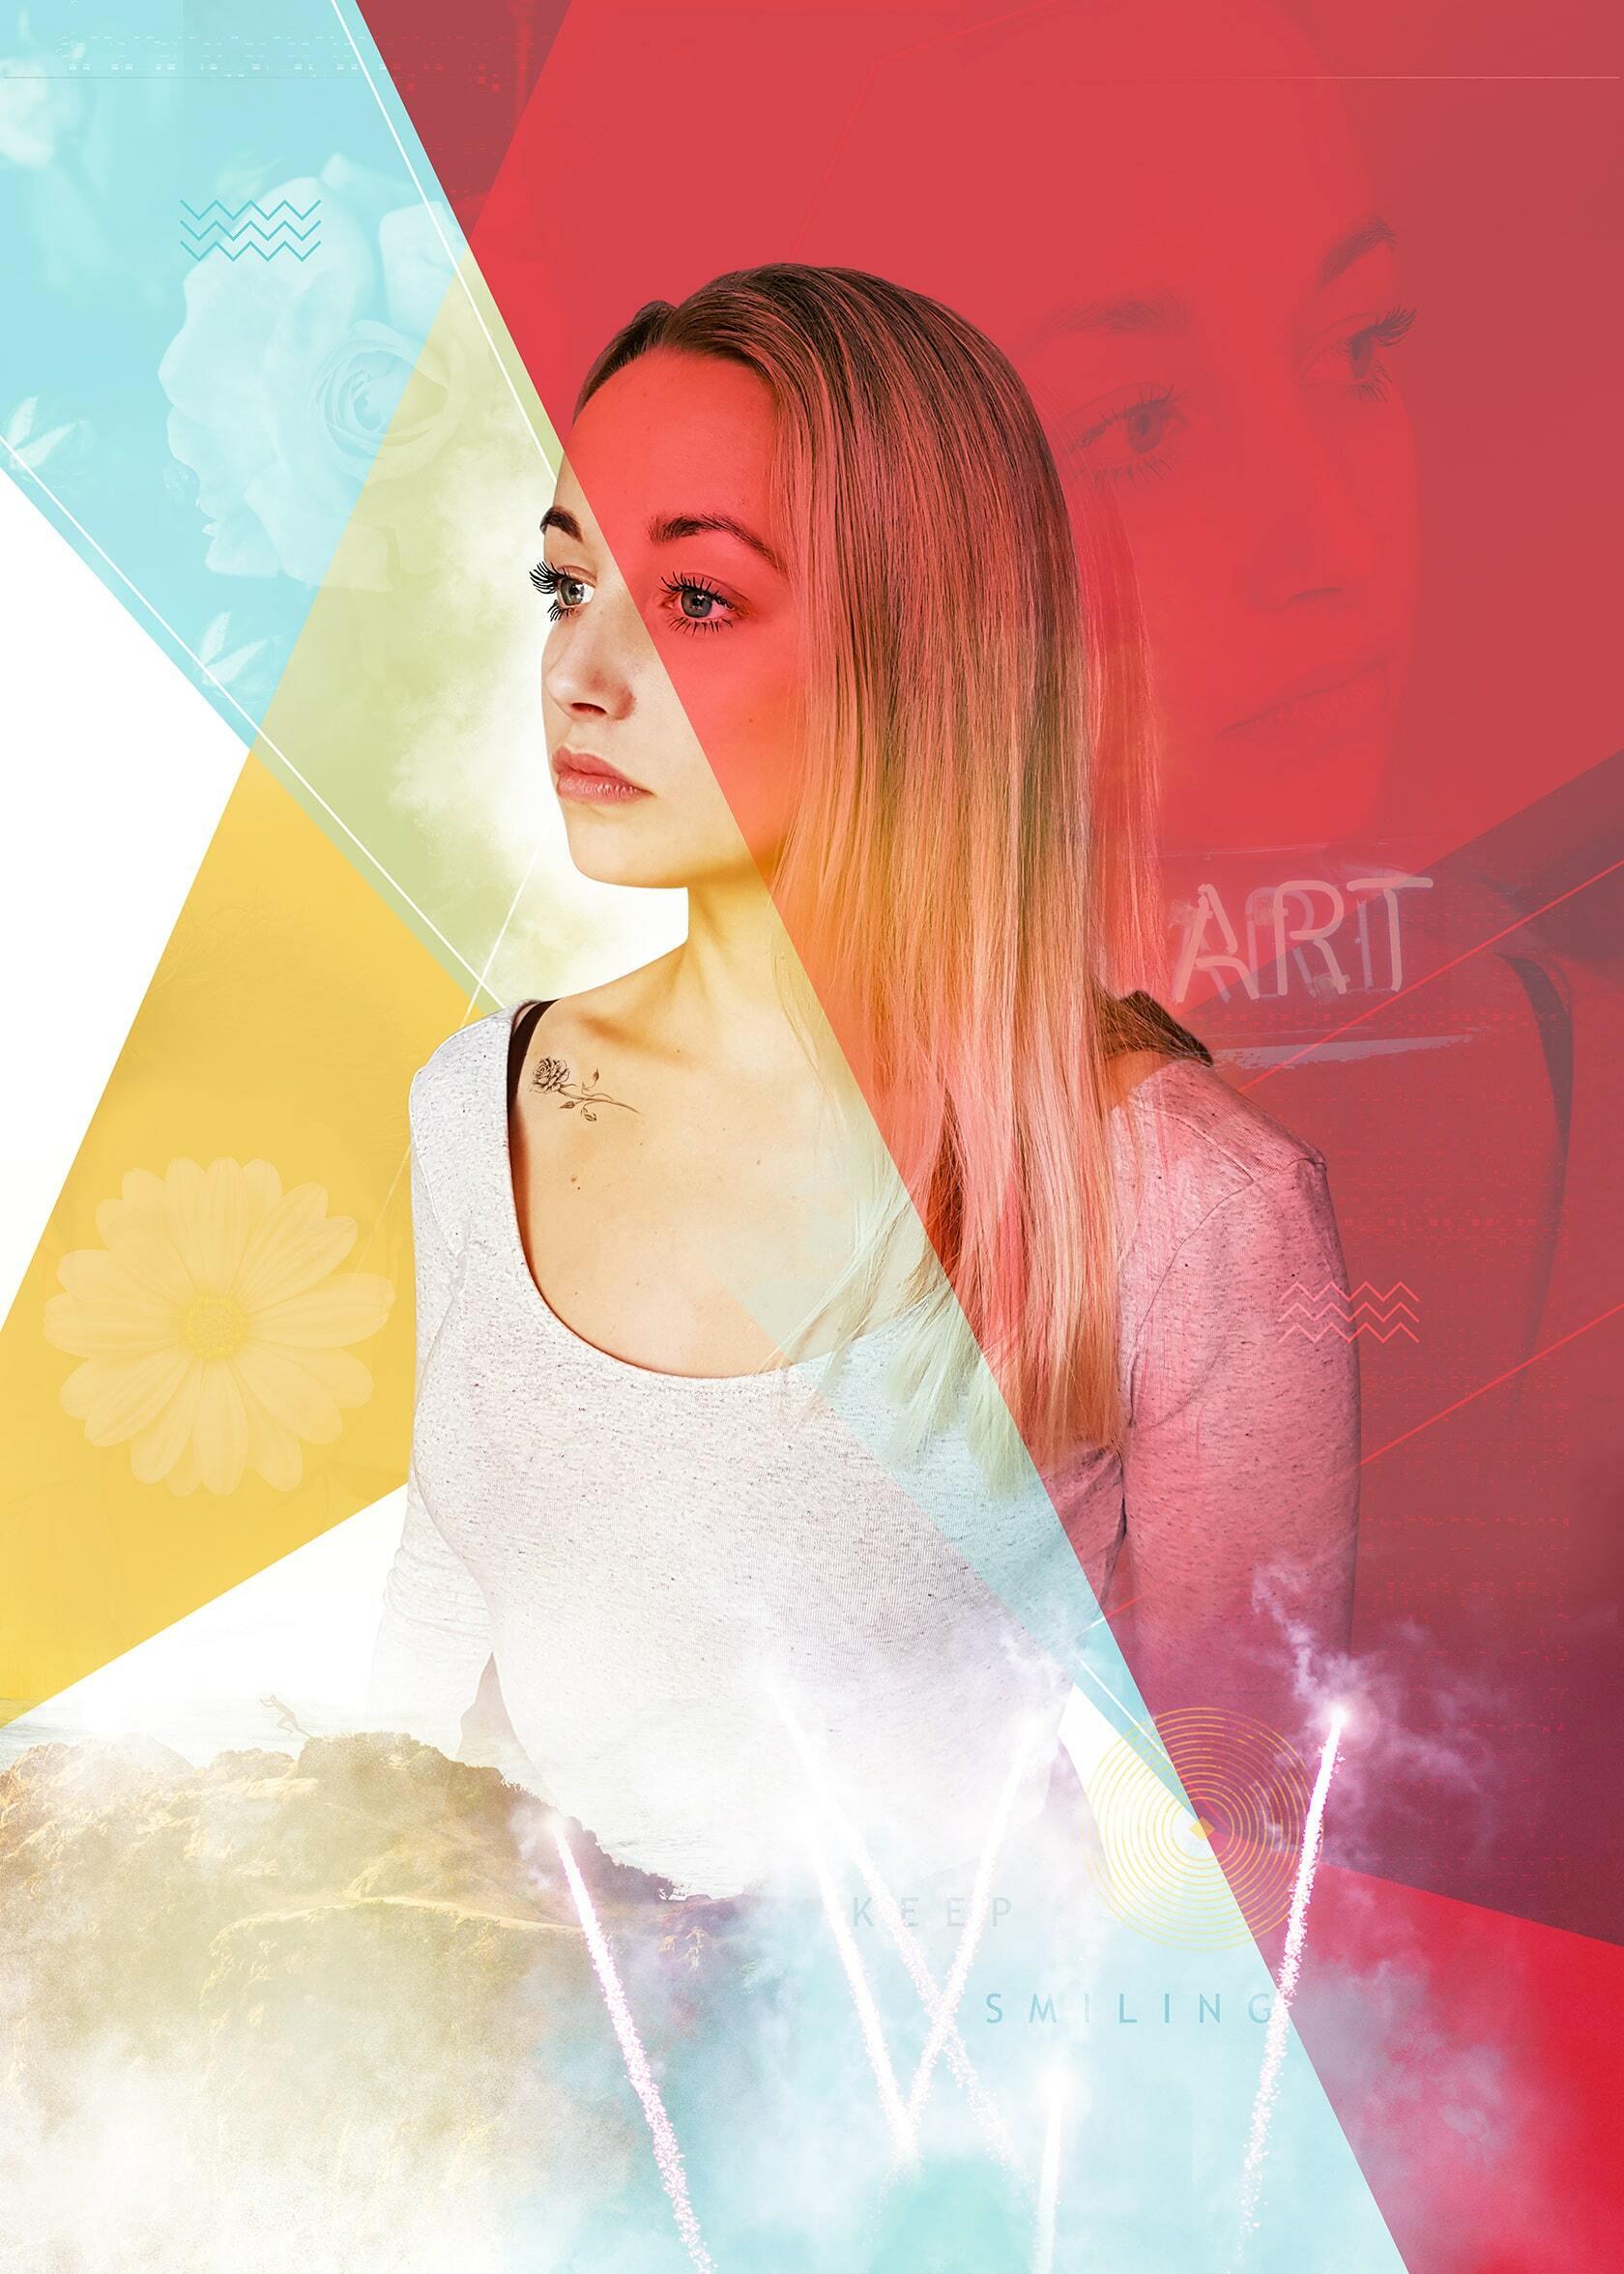 Digital art project abstract portraits ontwerp Artsy